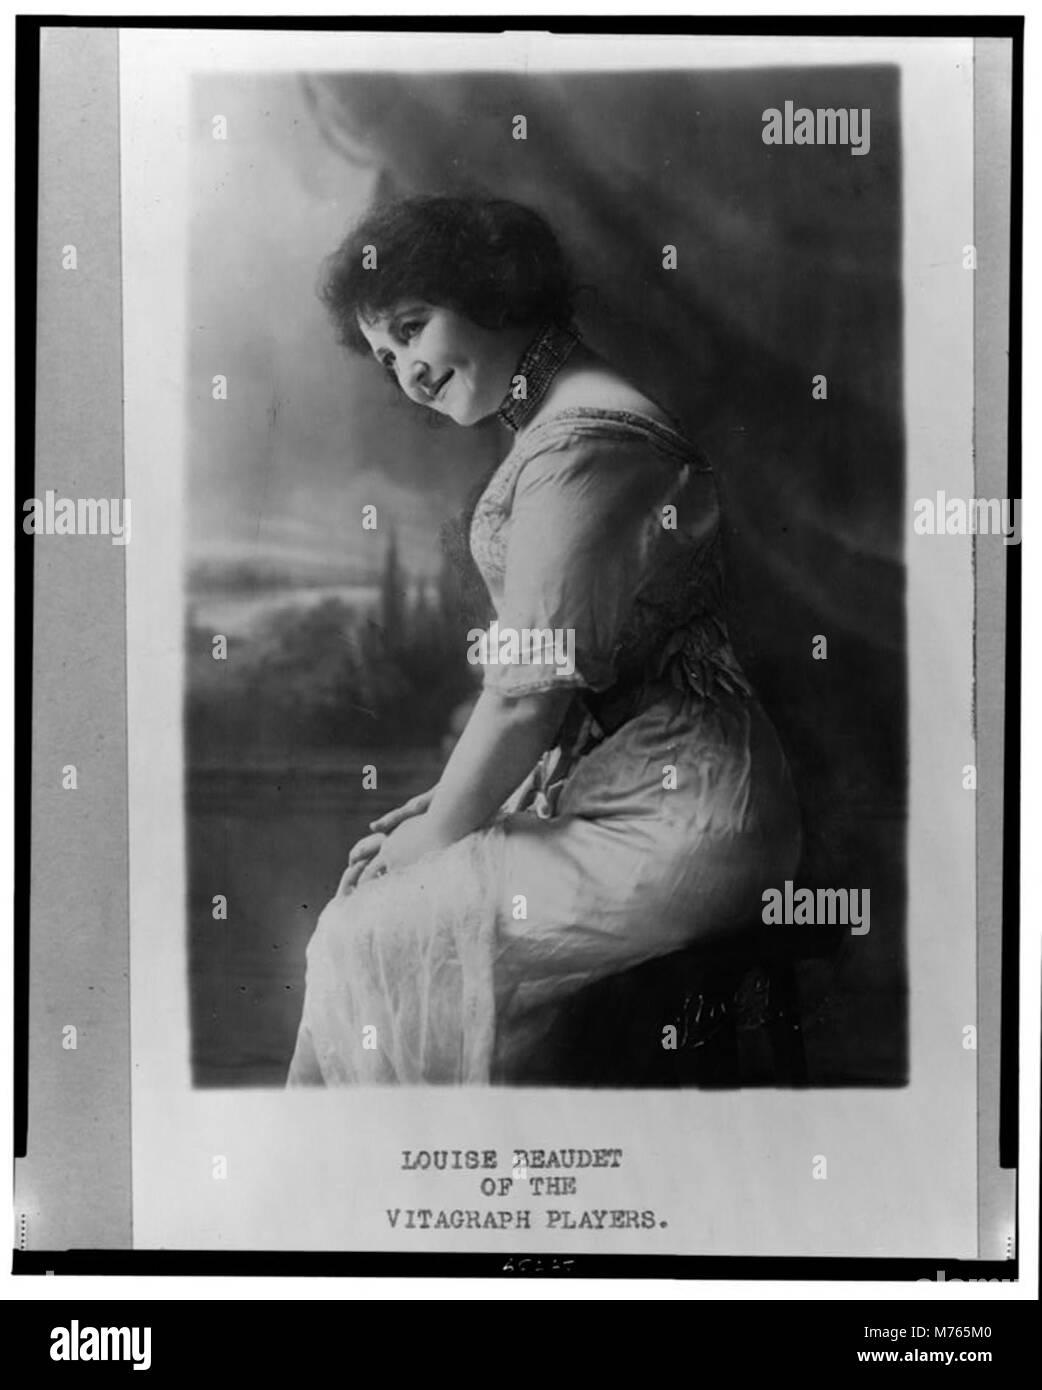 images Louise Beaudet